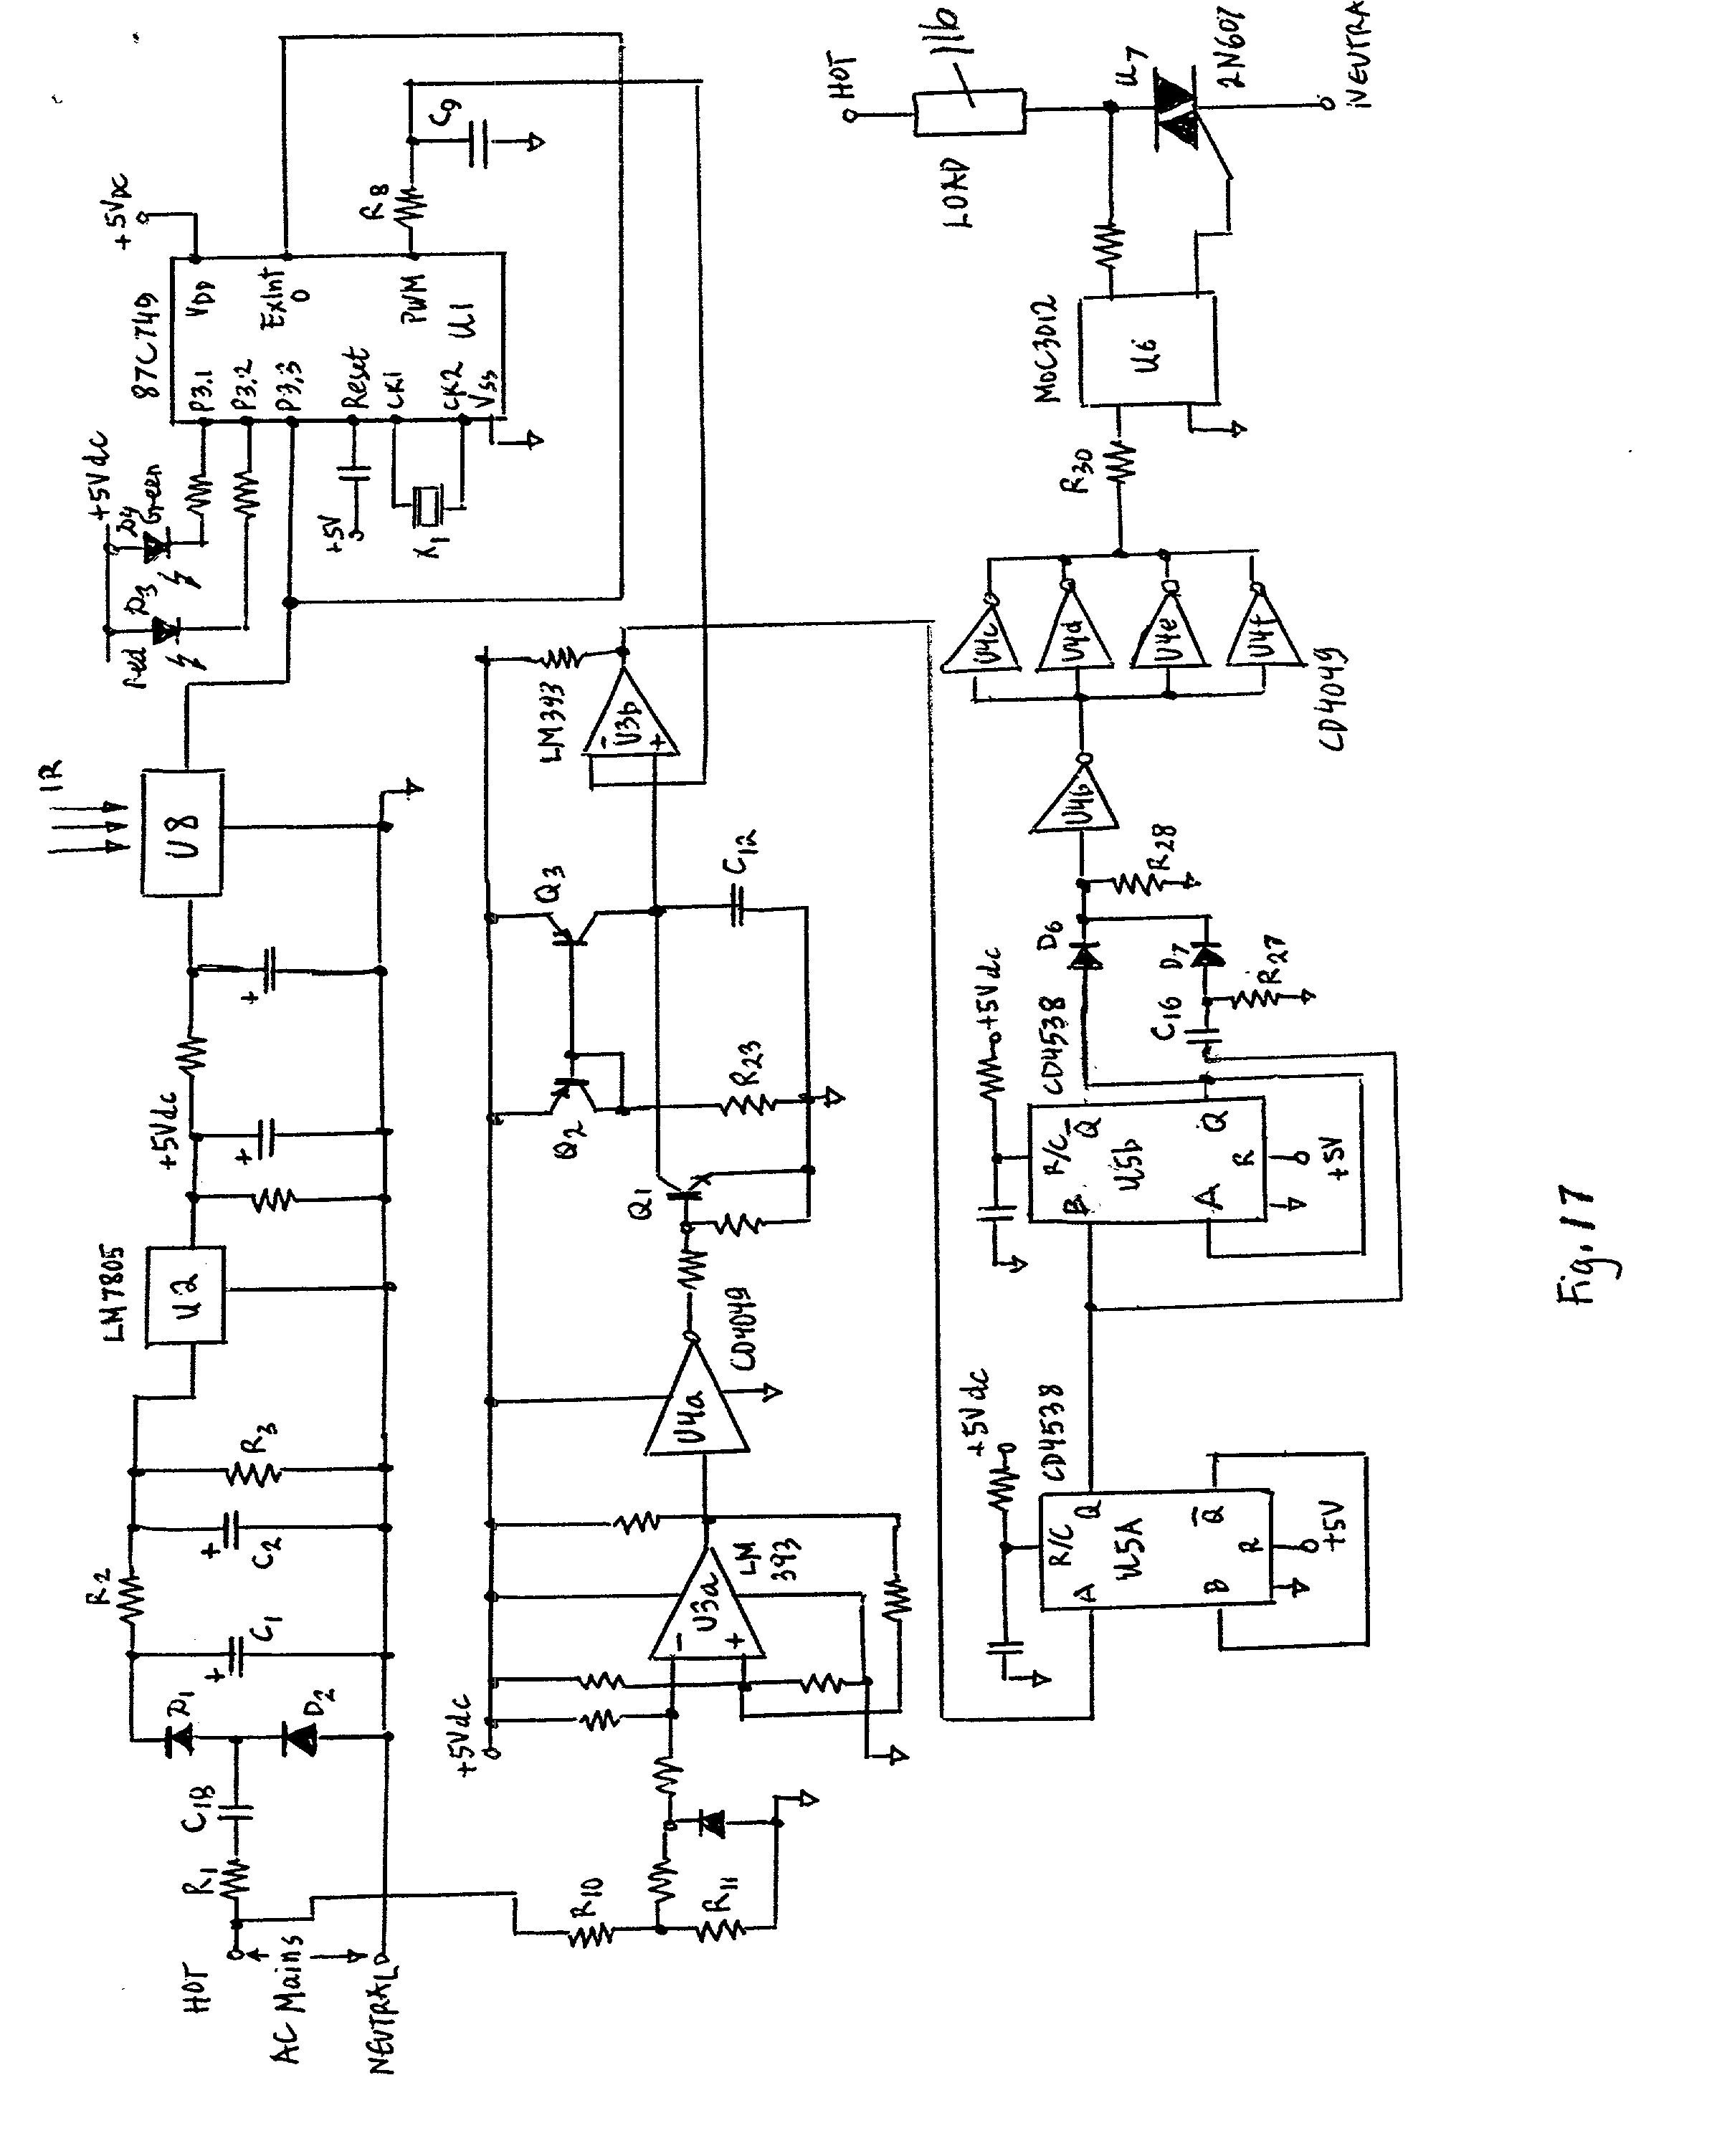 5614690 Seriesthermostatwiringdiagramsforsinglestagemultistage